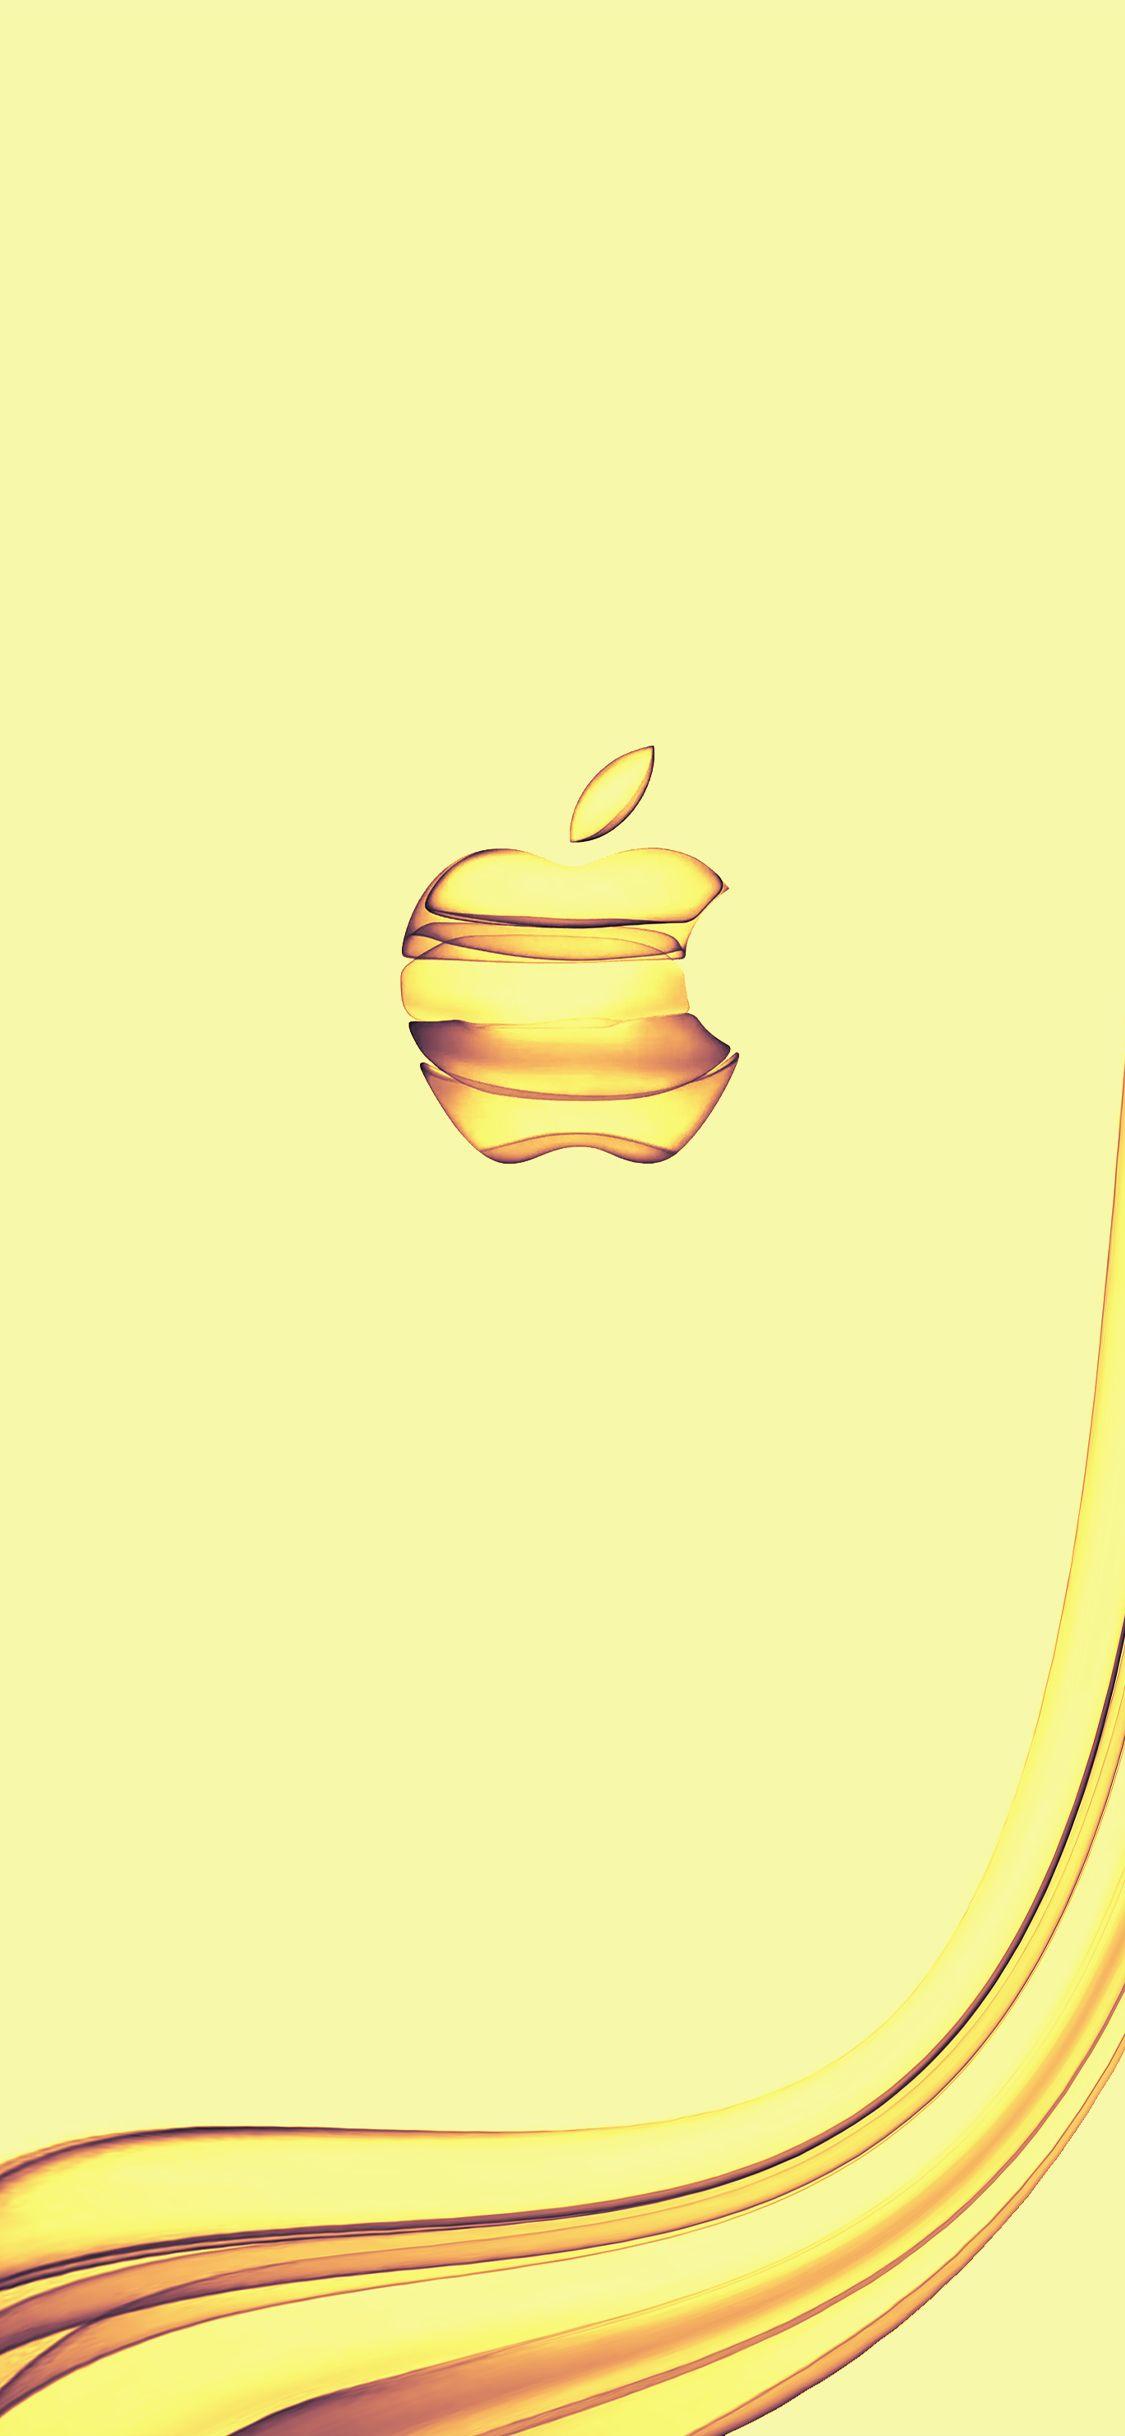 Pin by amanda perkins on apple logos iphone 11 apple